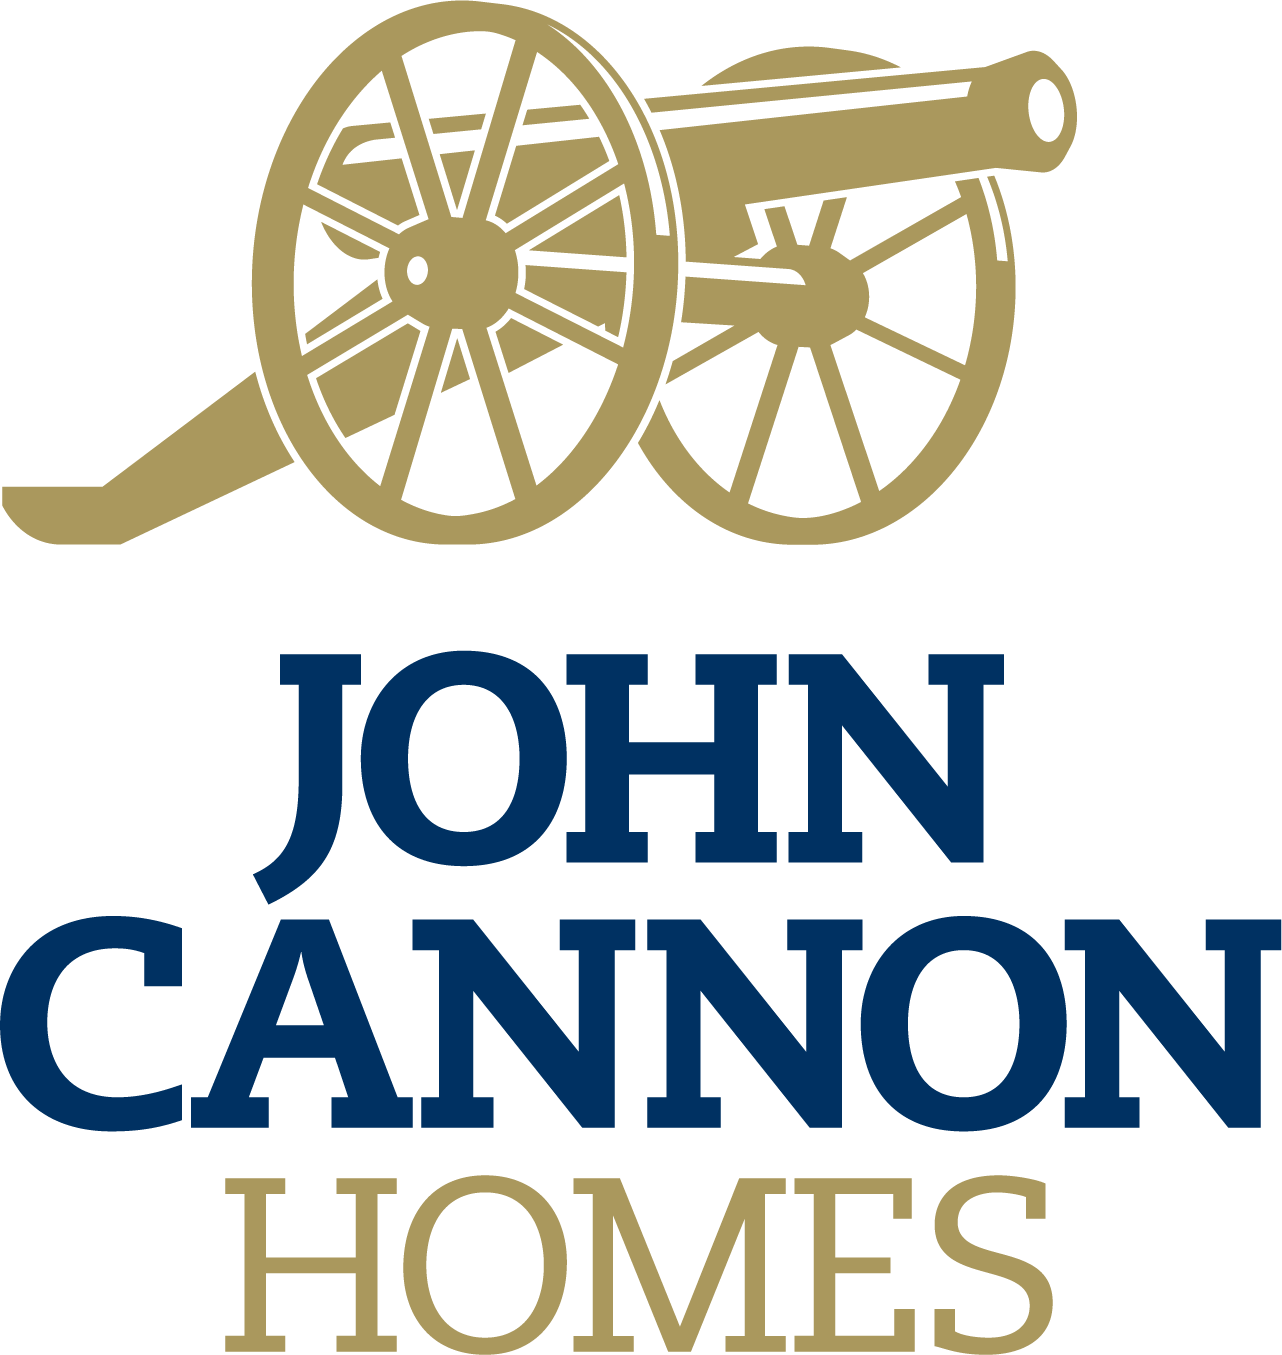 John-Cannon-Homes-Logo.png